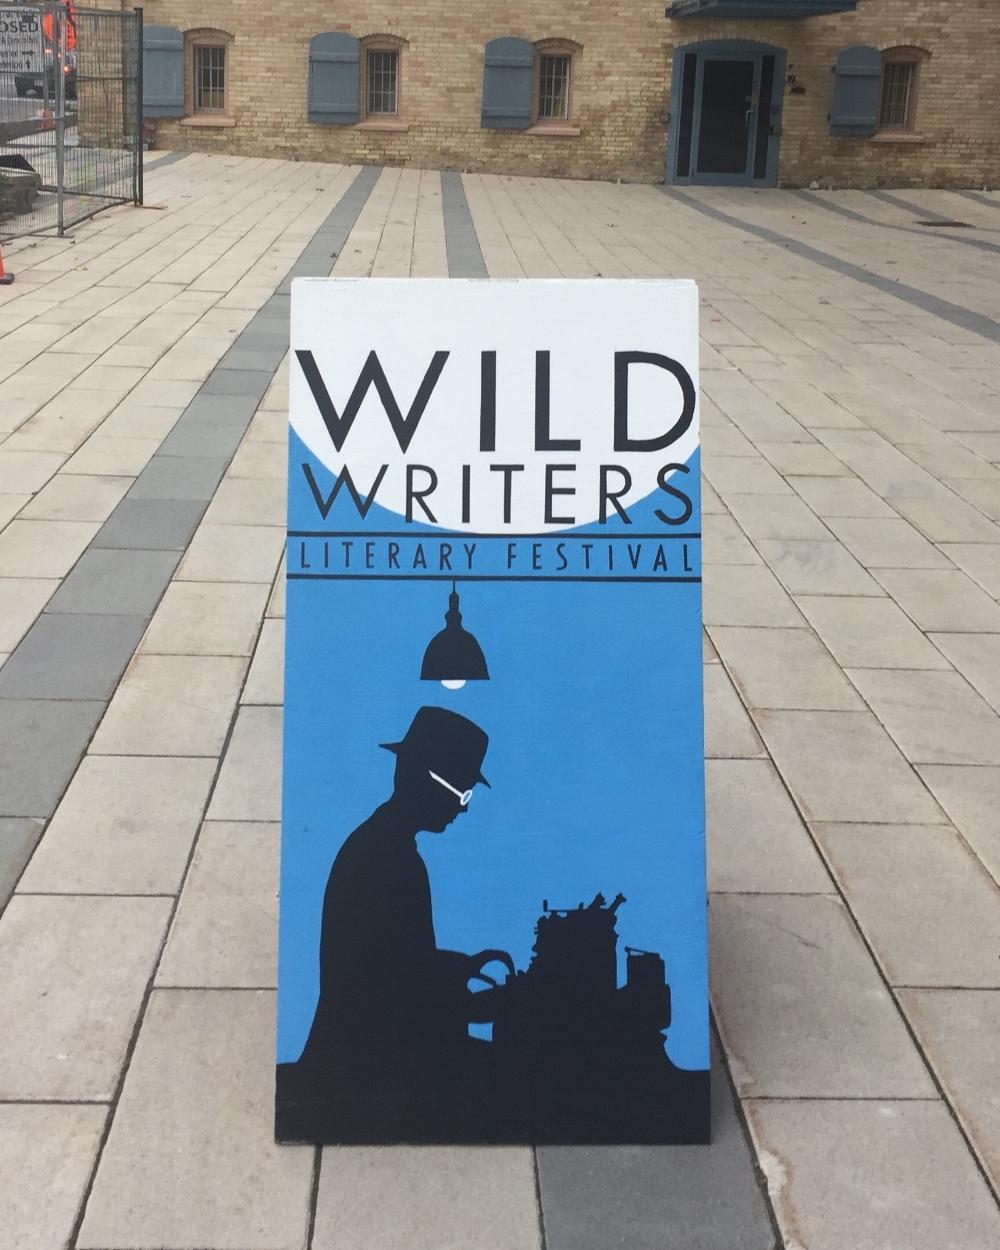 wild writers festival sign.jpg